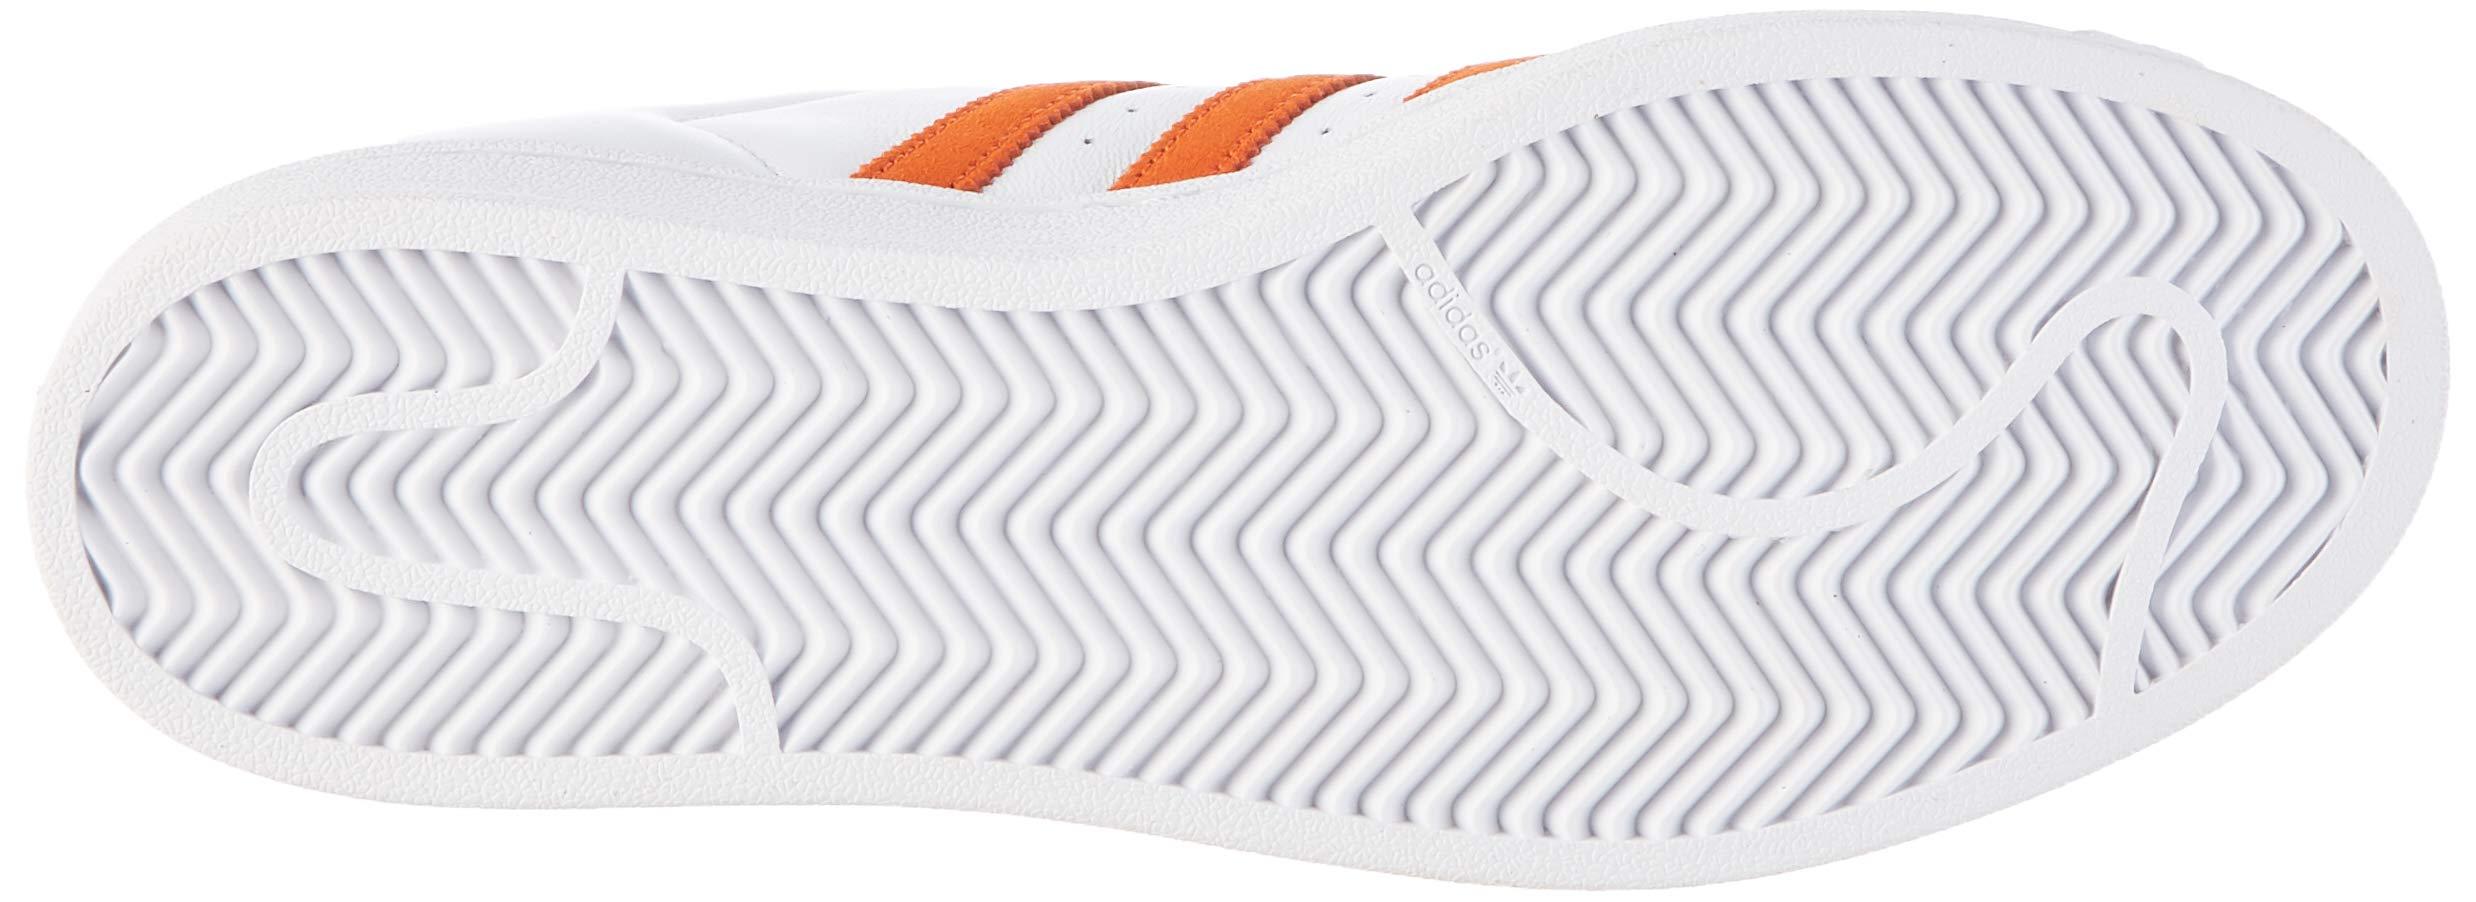 adidas Superstar, Scarpe da Ginnastica Uomo 3 spesavip